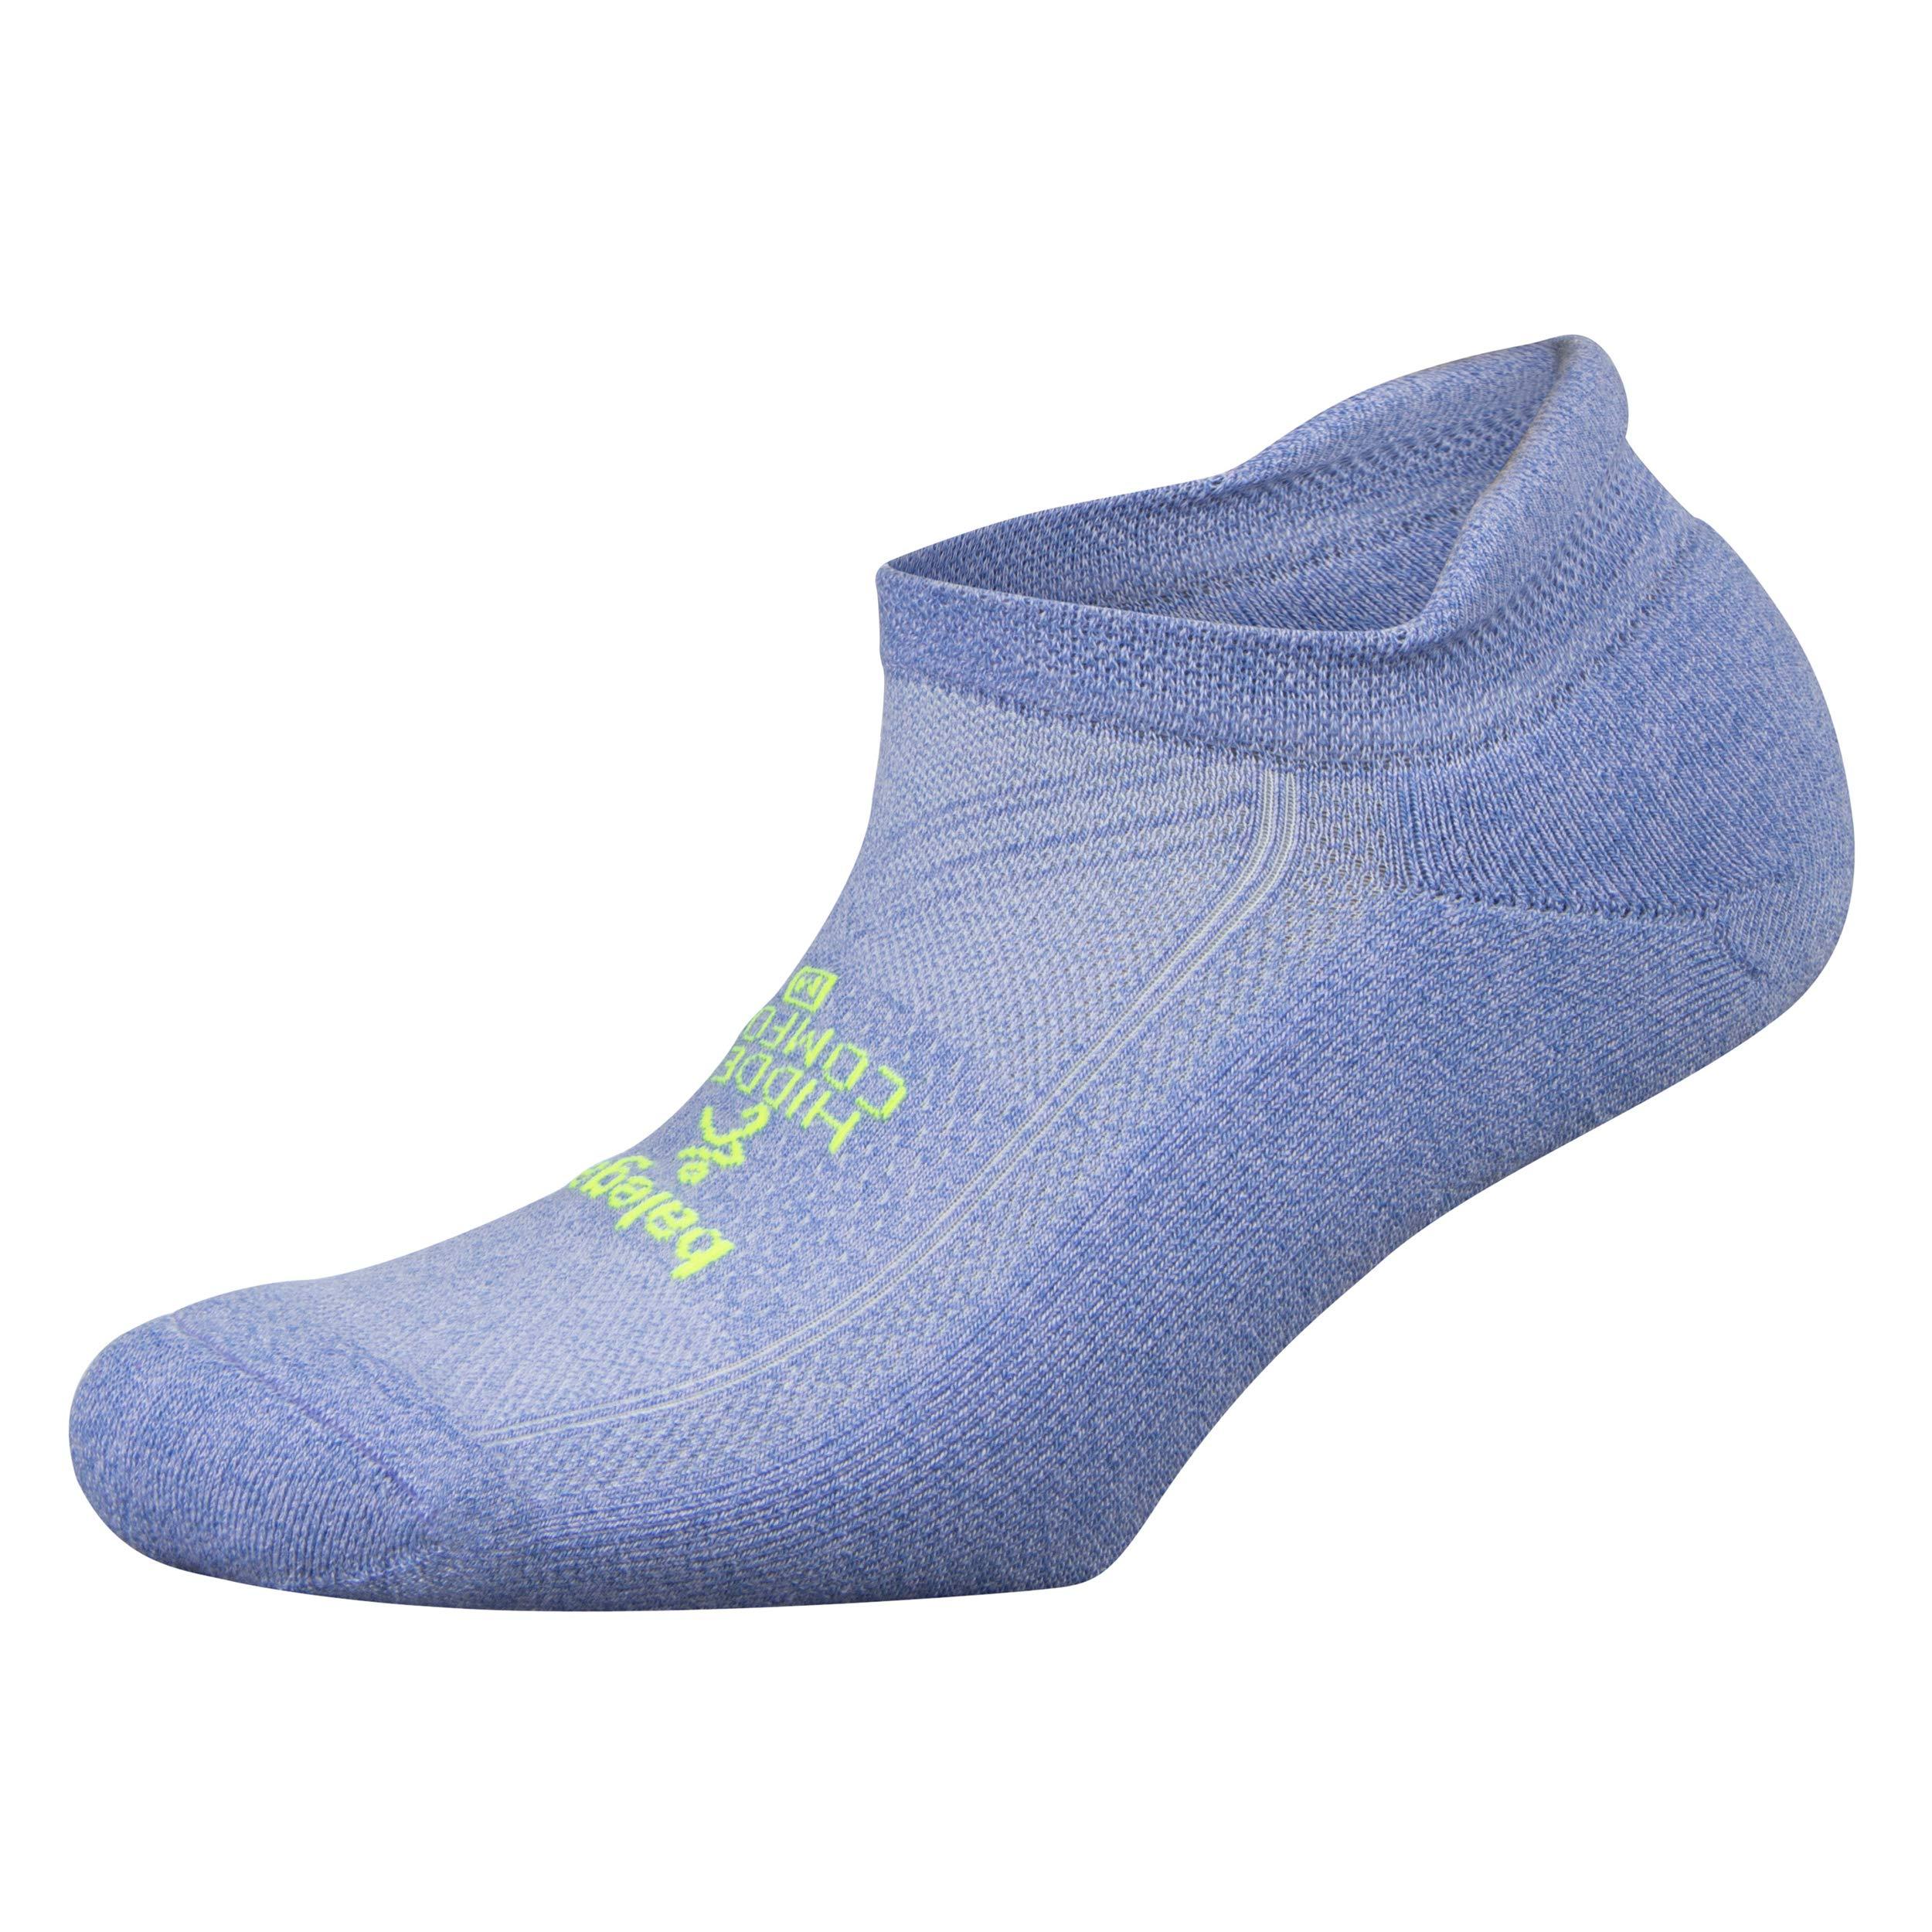 Balega Hidden Comfort No-Show Running Socks for Men and Women (1 Pair), Lilac, Medium